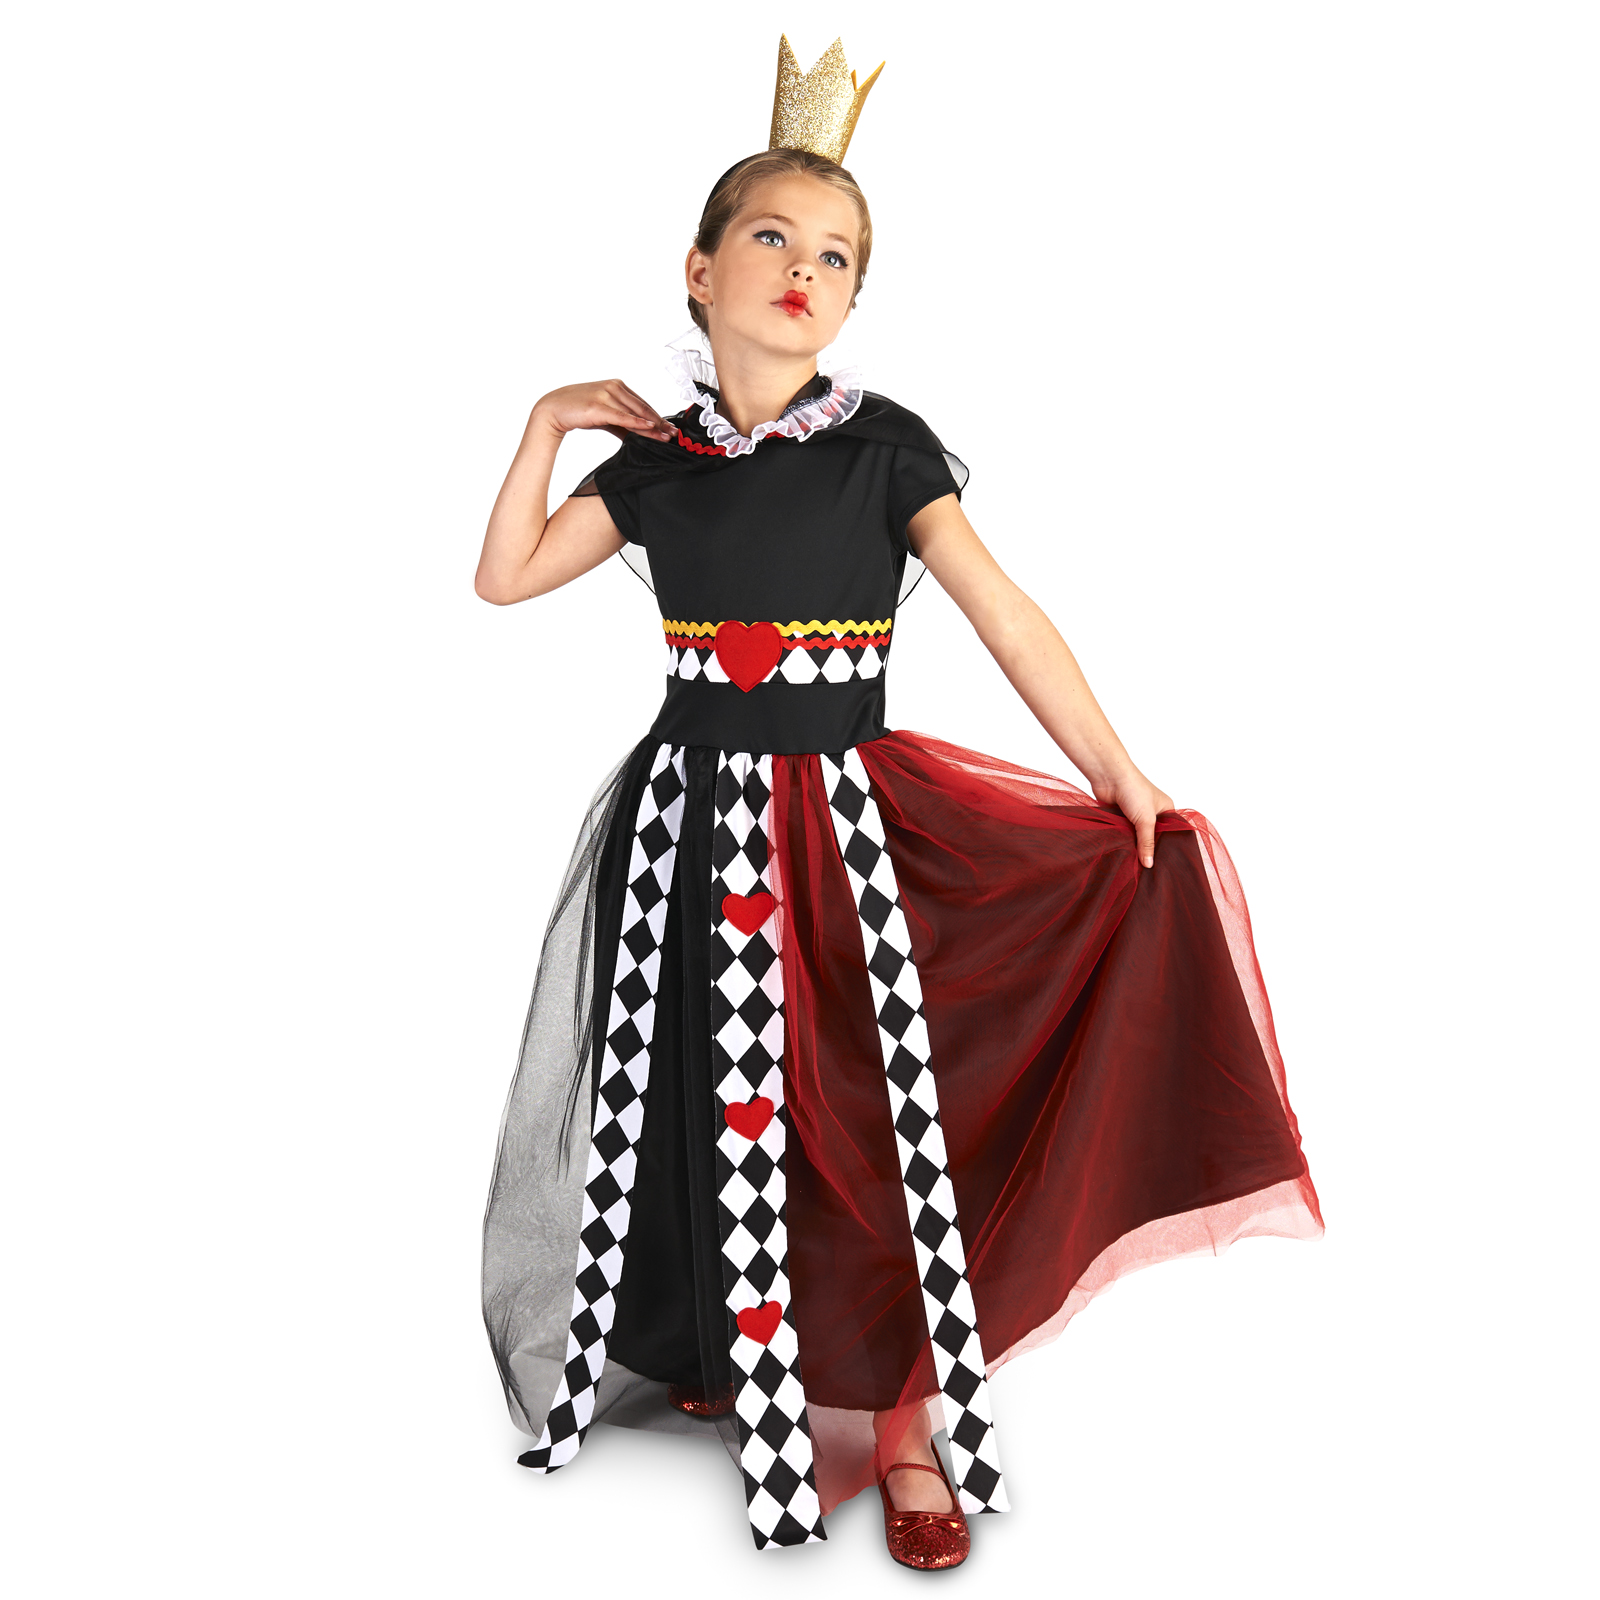 all kidsu0027 halloween costume themes